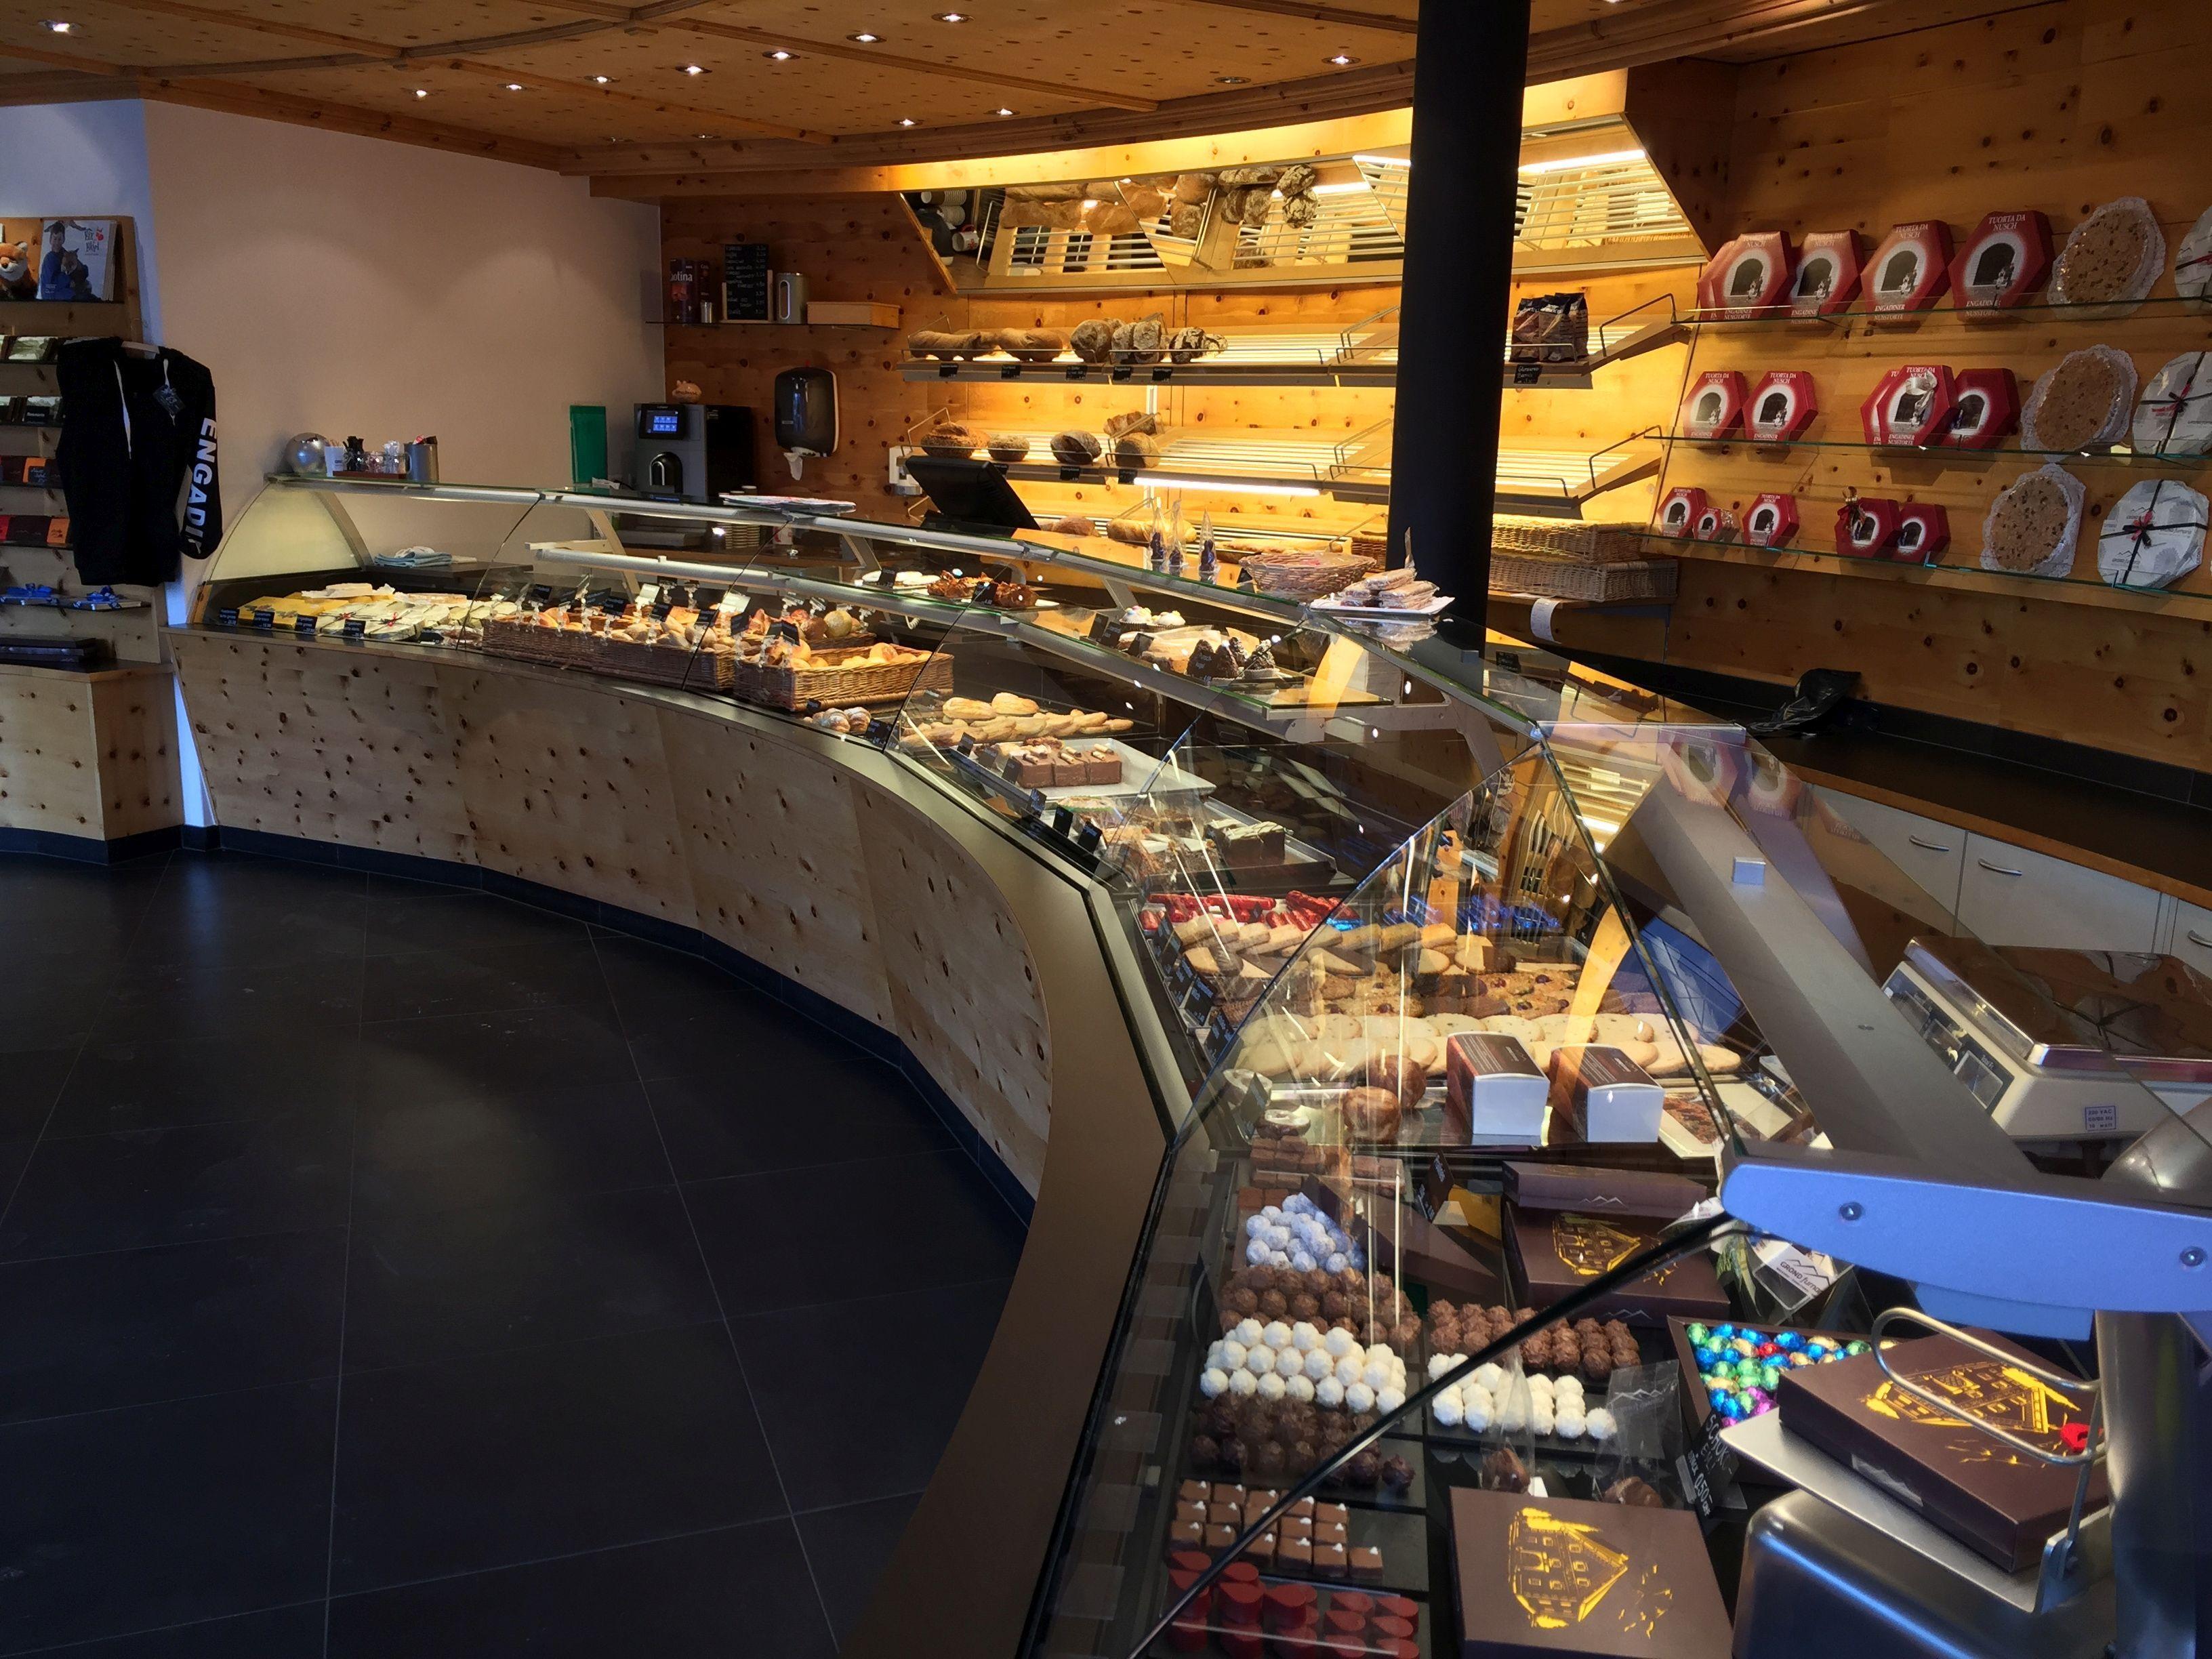 Furnaria (Bäckerei) Grond SA Slide 1